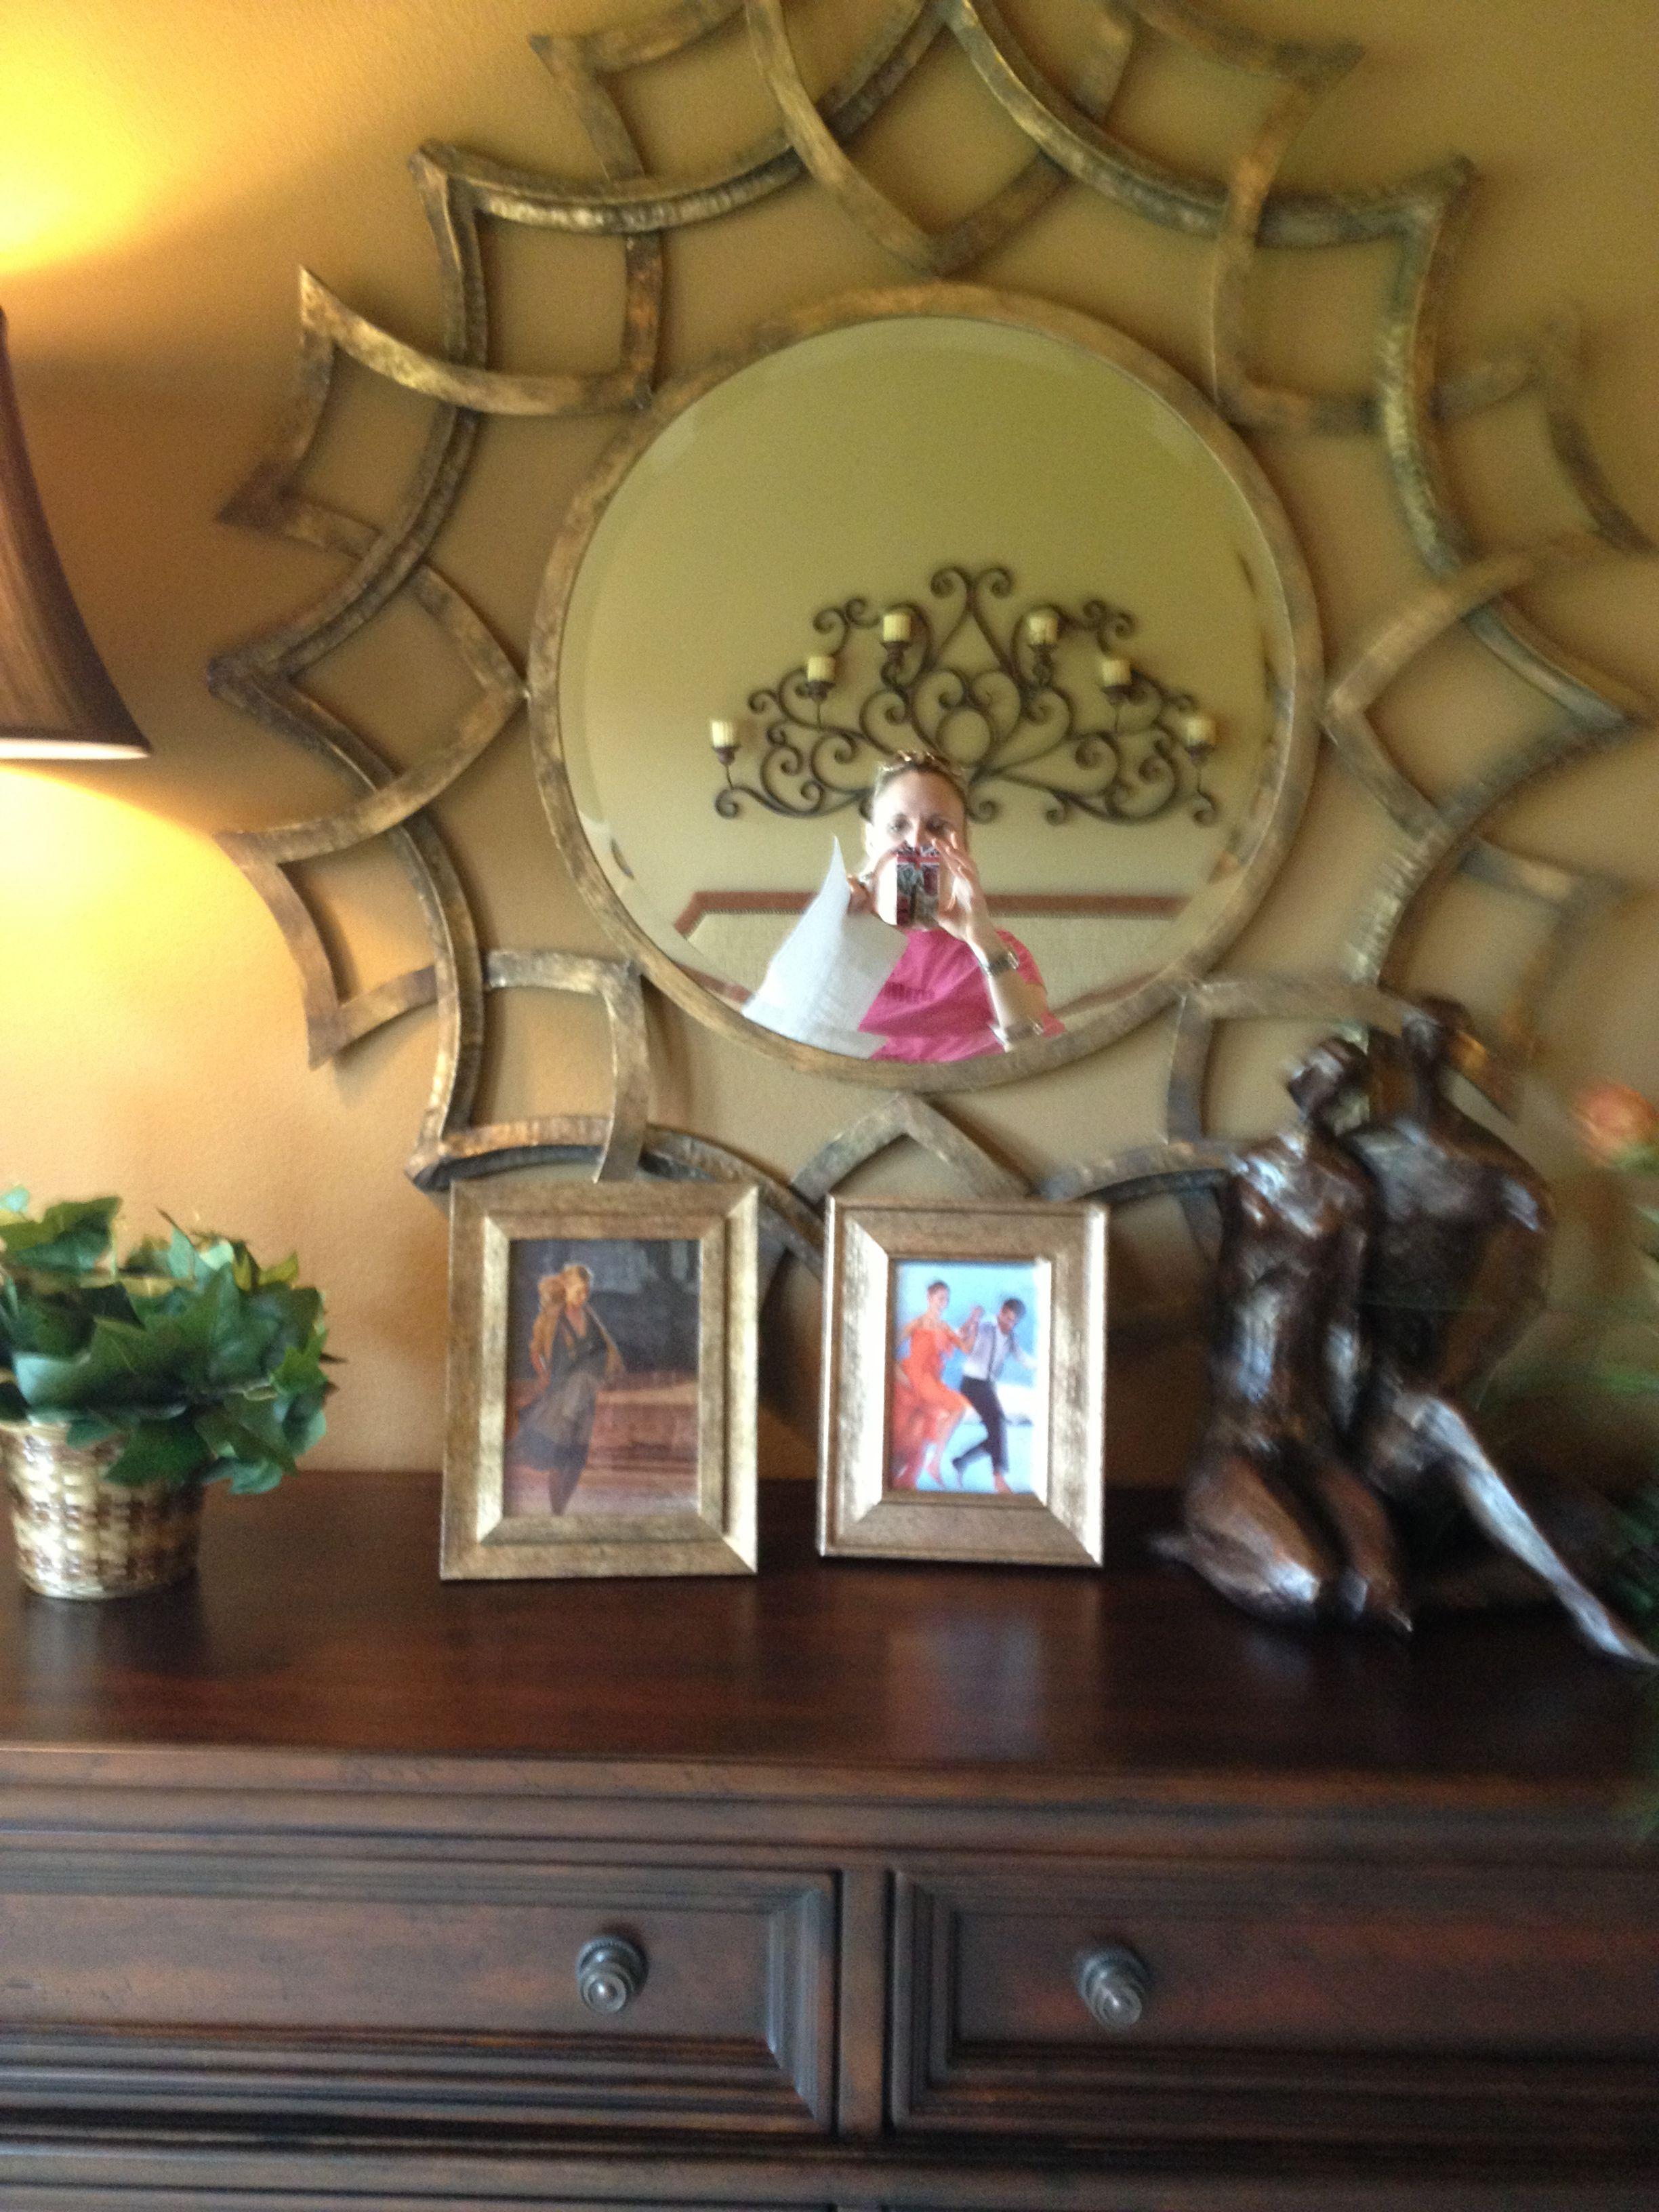 Love the mirror- model home